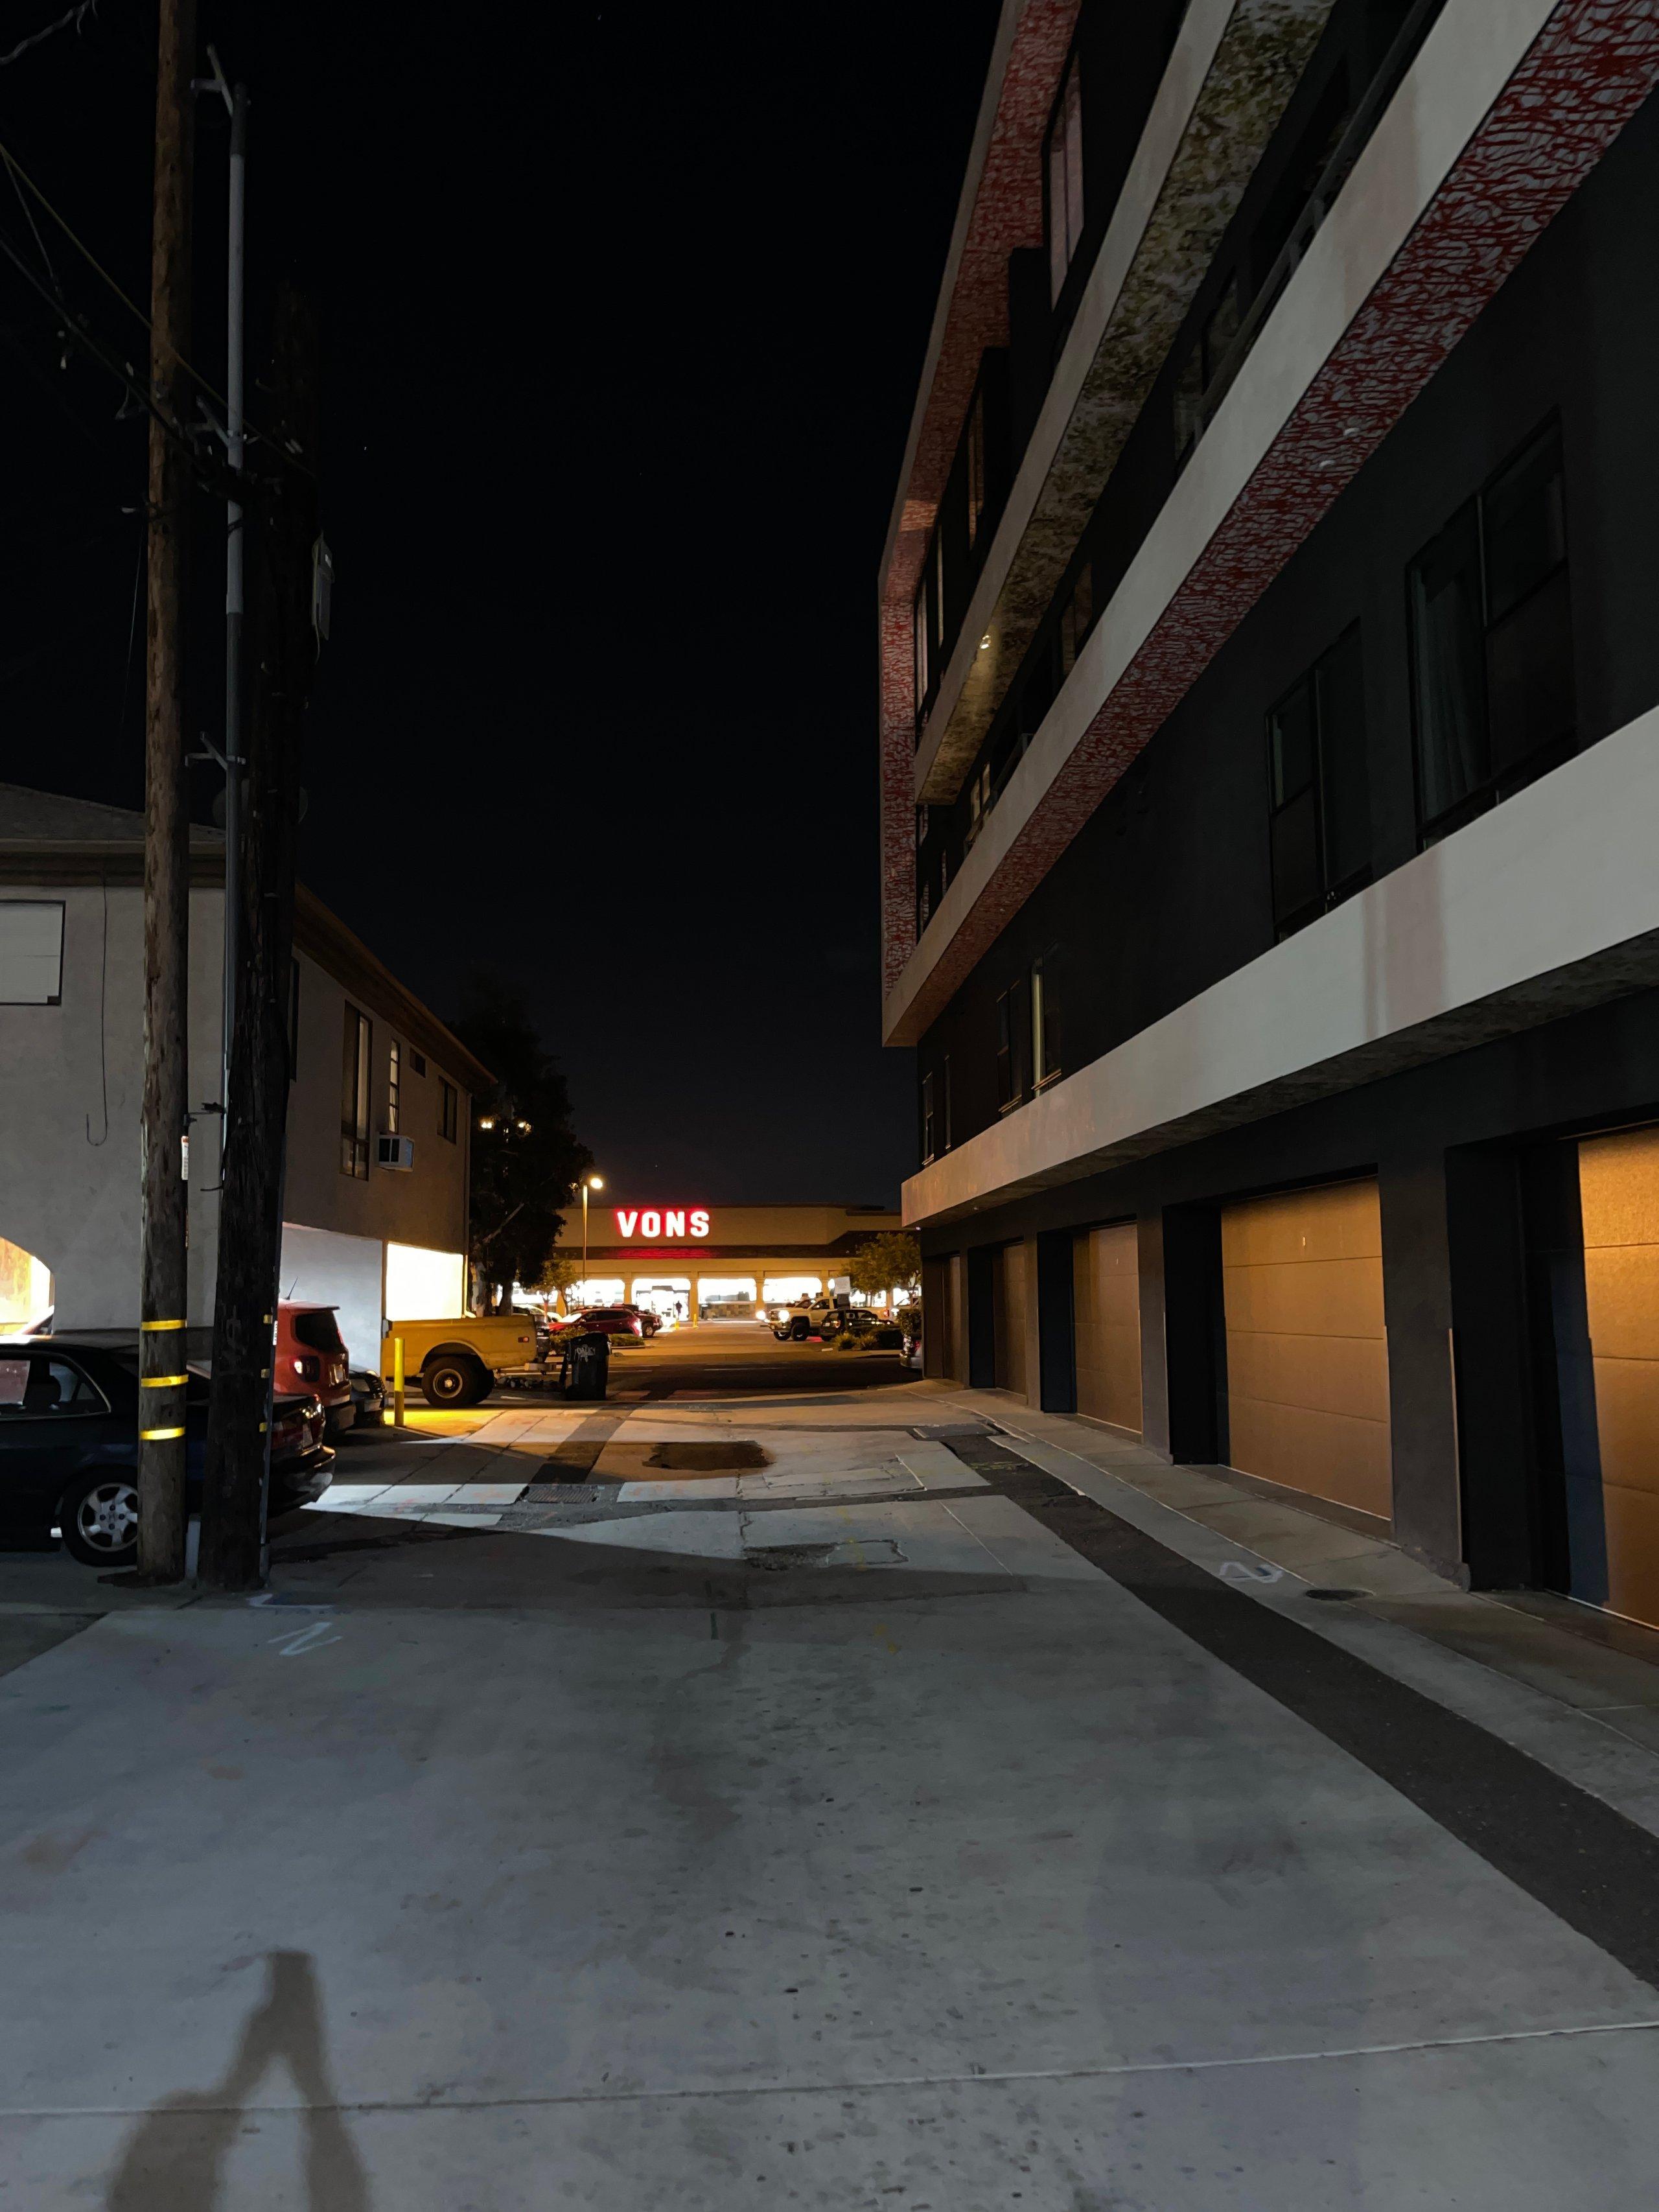 12x12 Driveway self storage unit